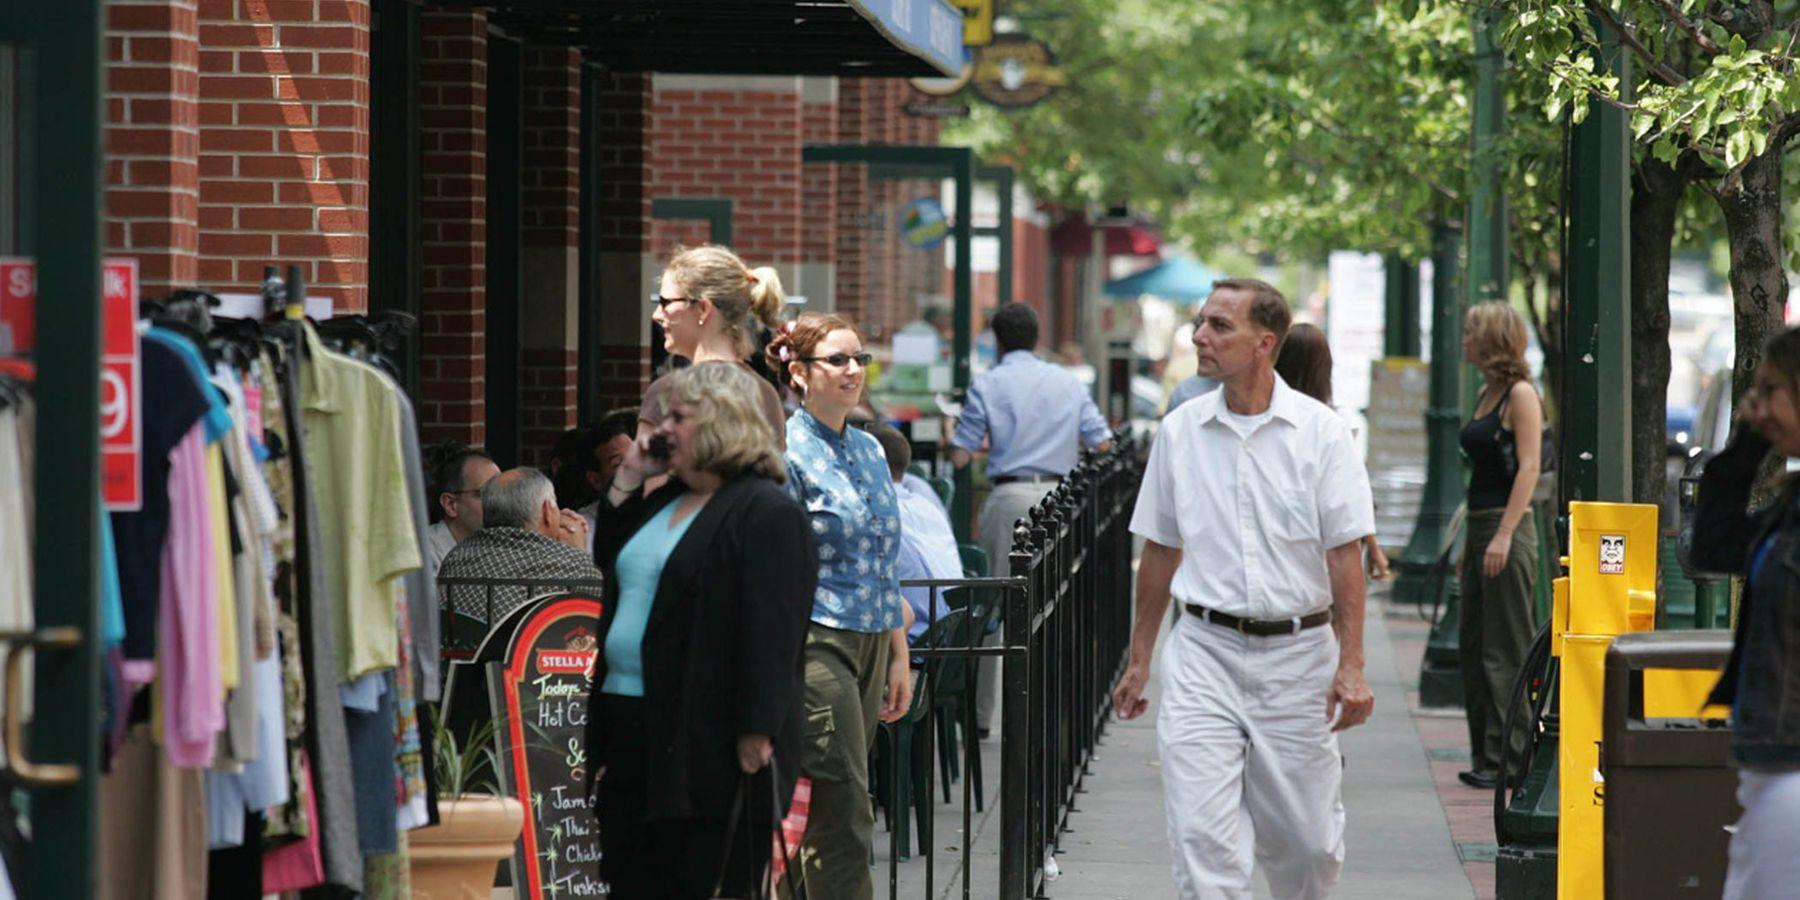 Corning - New York State - Amerika - Doets Reizen